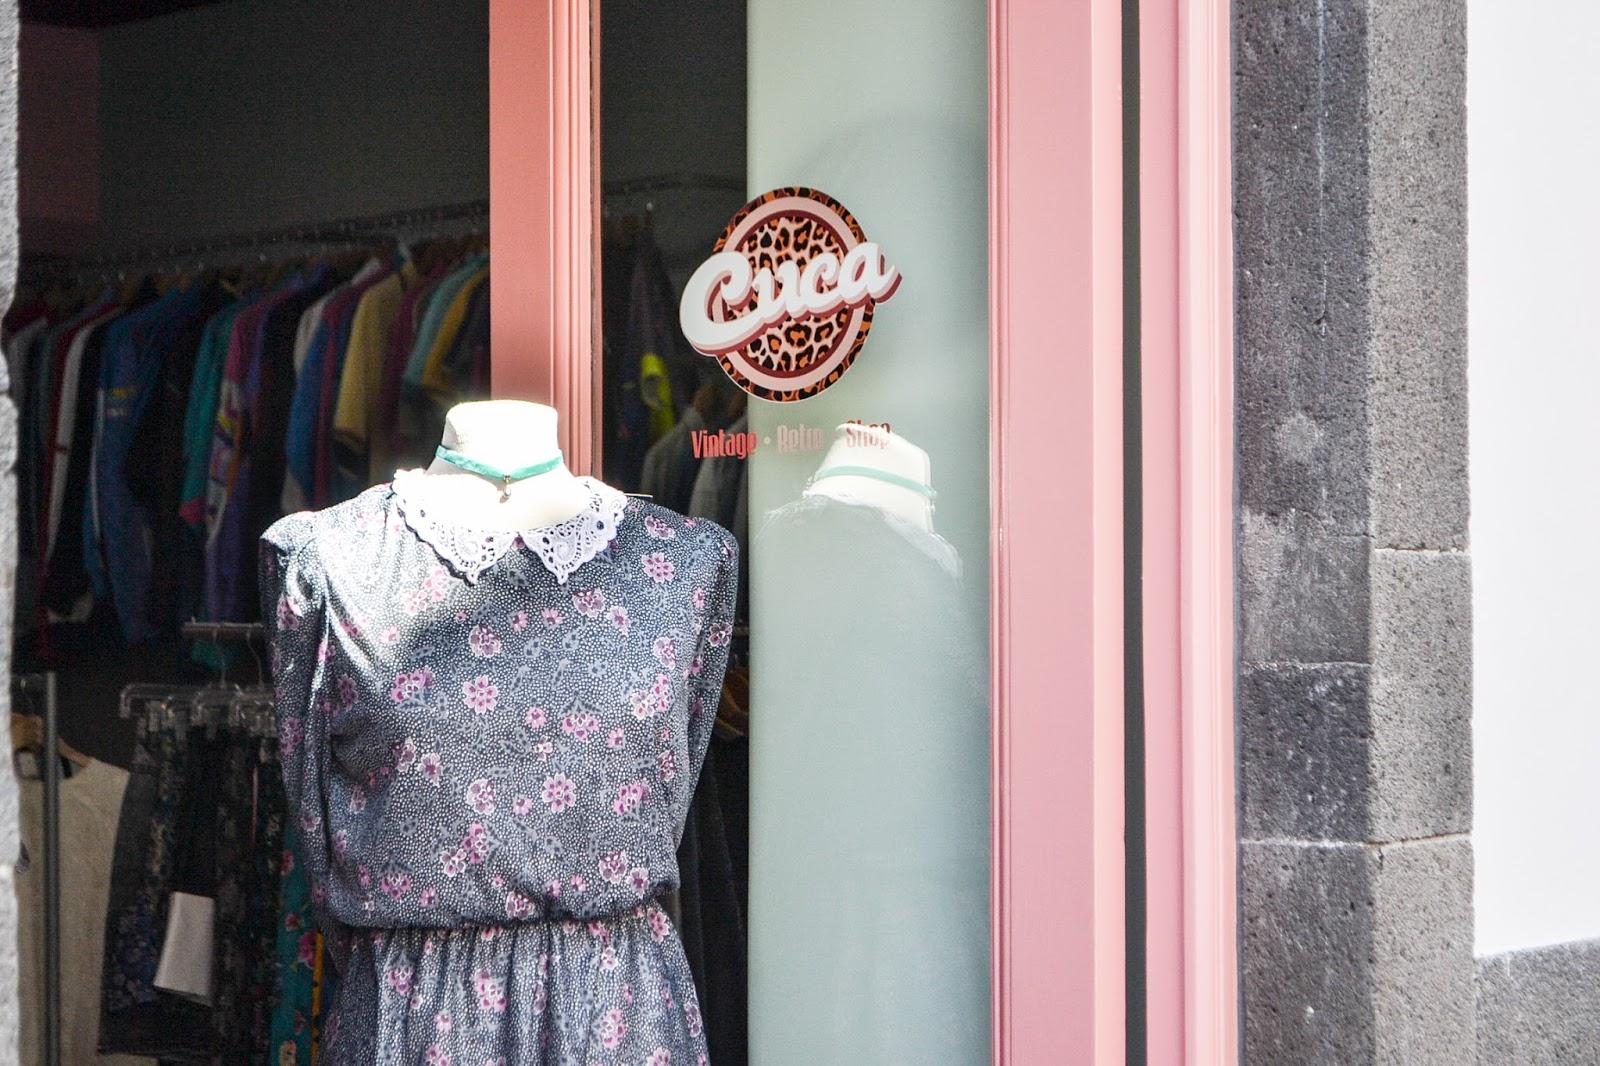 Cuca vintage retro shop, Funchal, Madeira